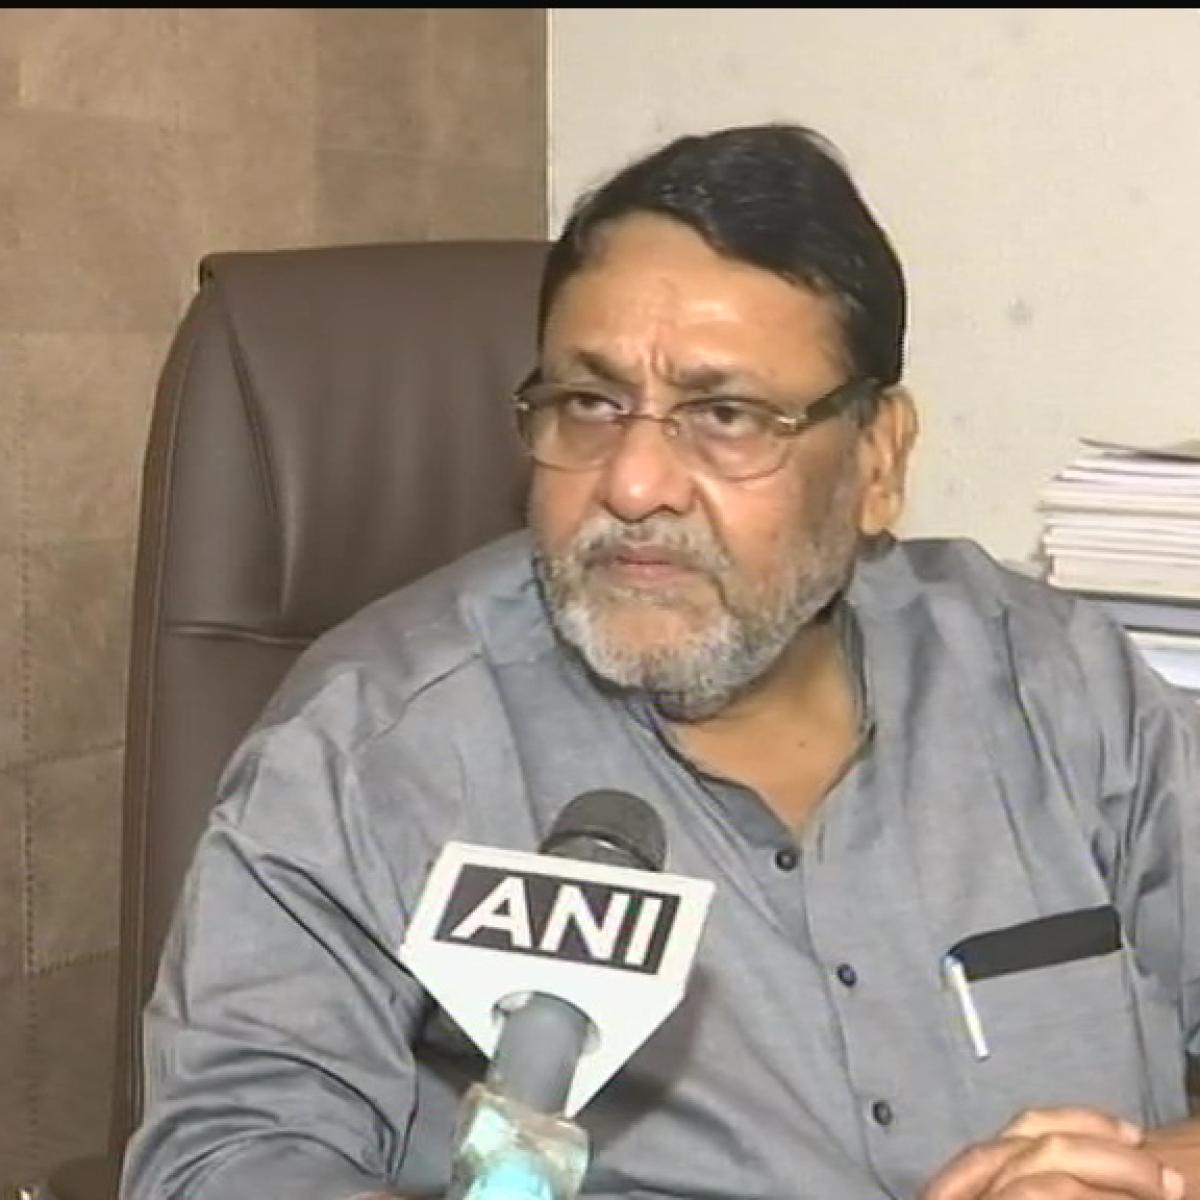 Postoperative procedure performed on Sharad Pawar, he is now recuperating: Nawab Malik